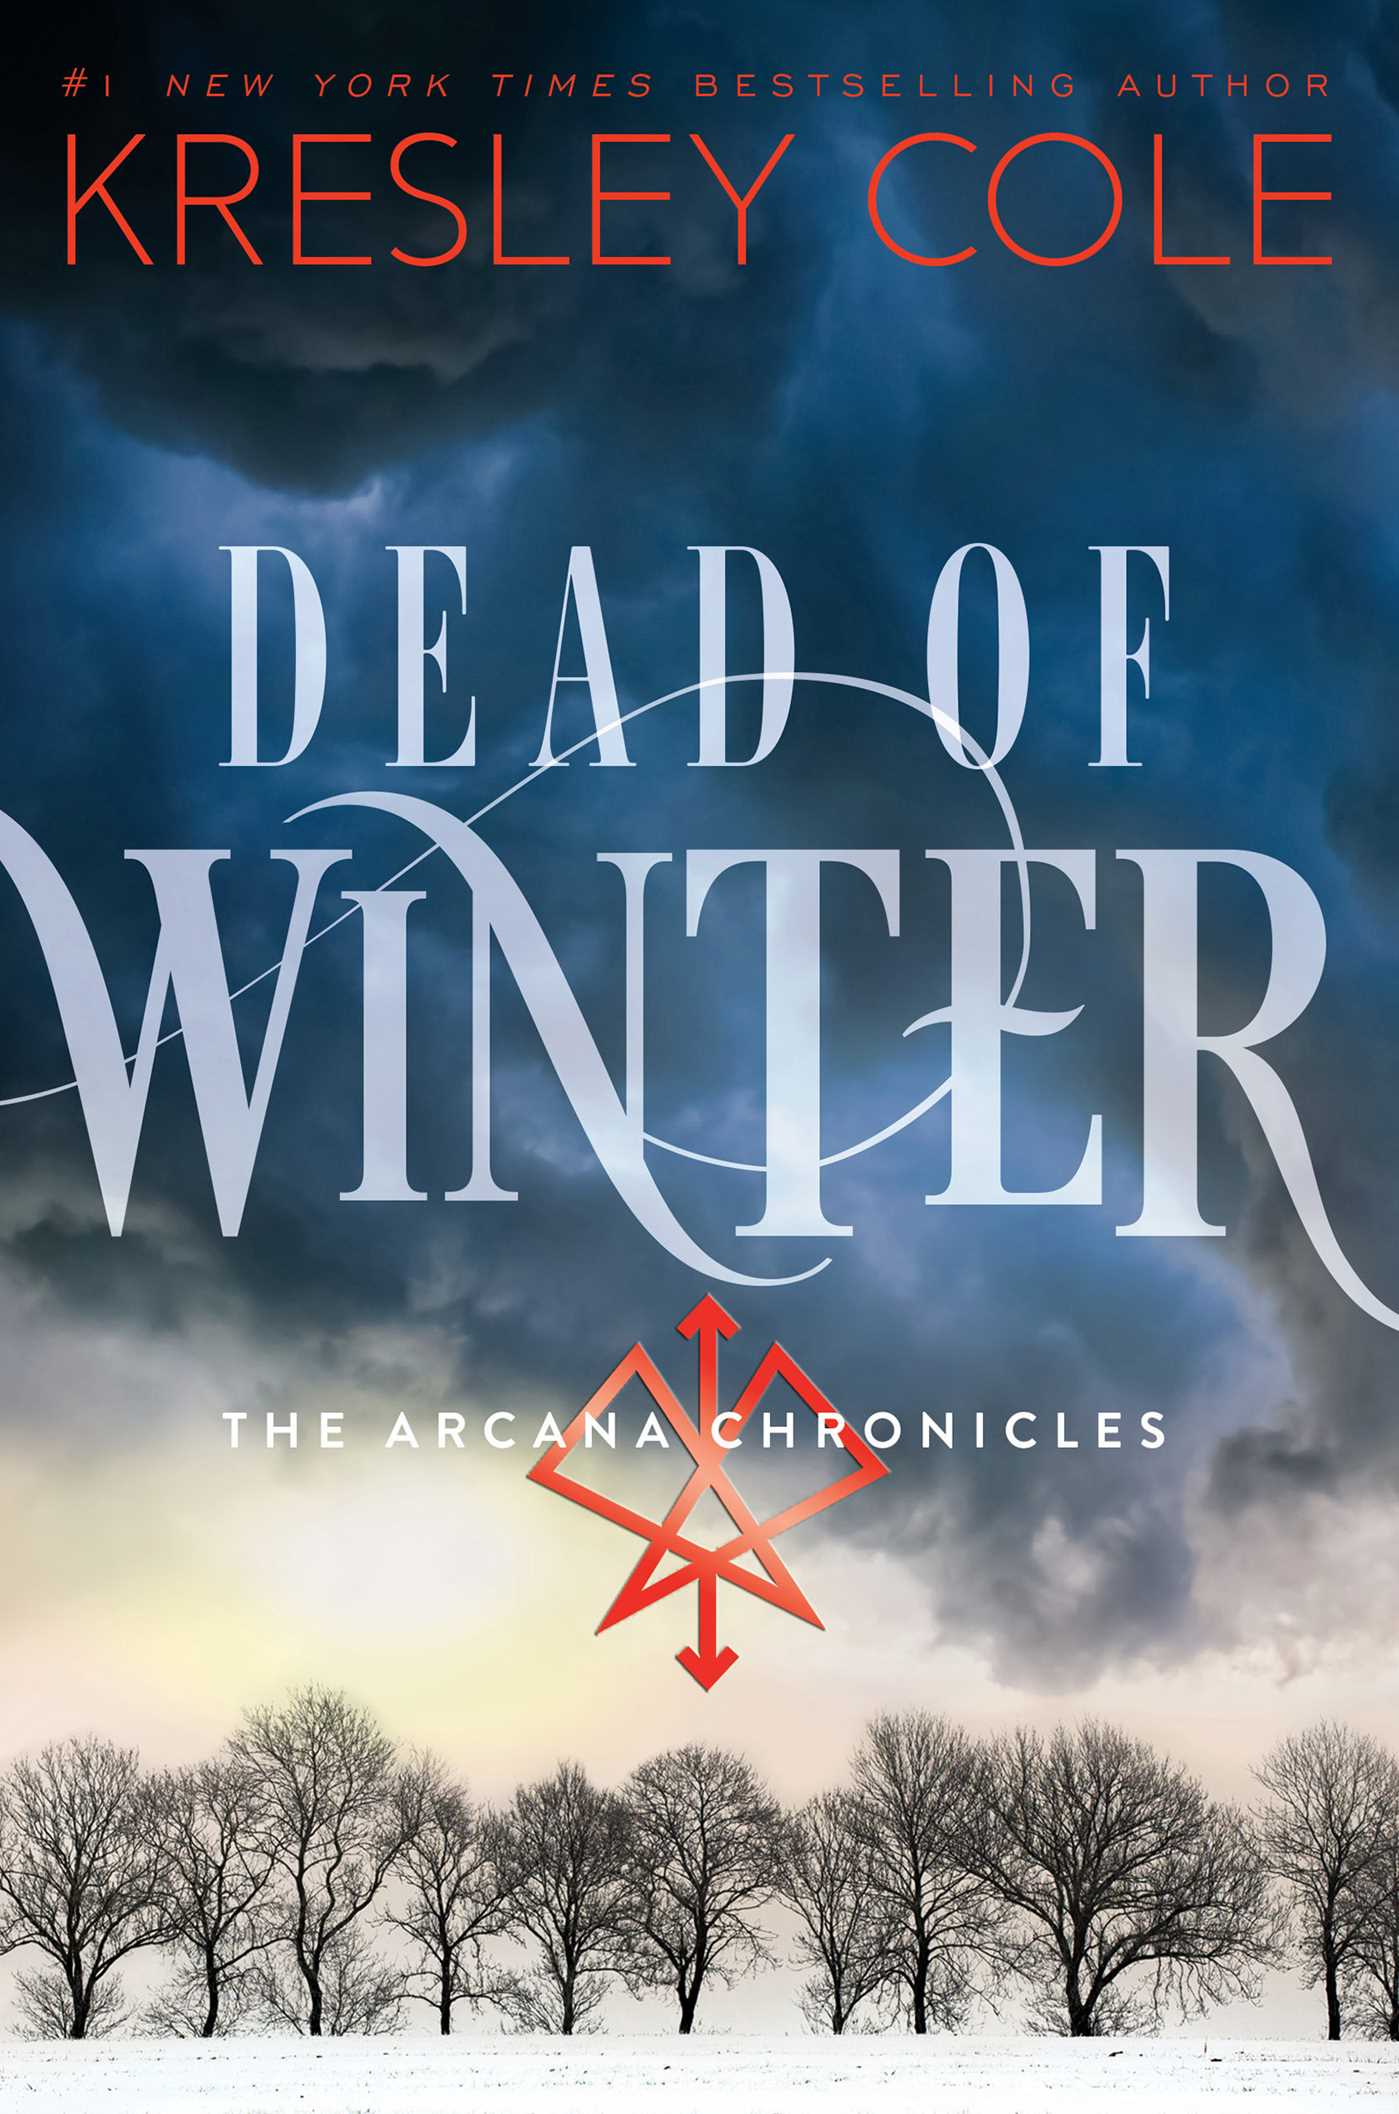 Dead of winter 9781471122866 hr